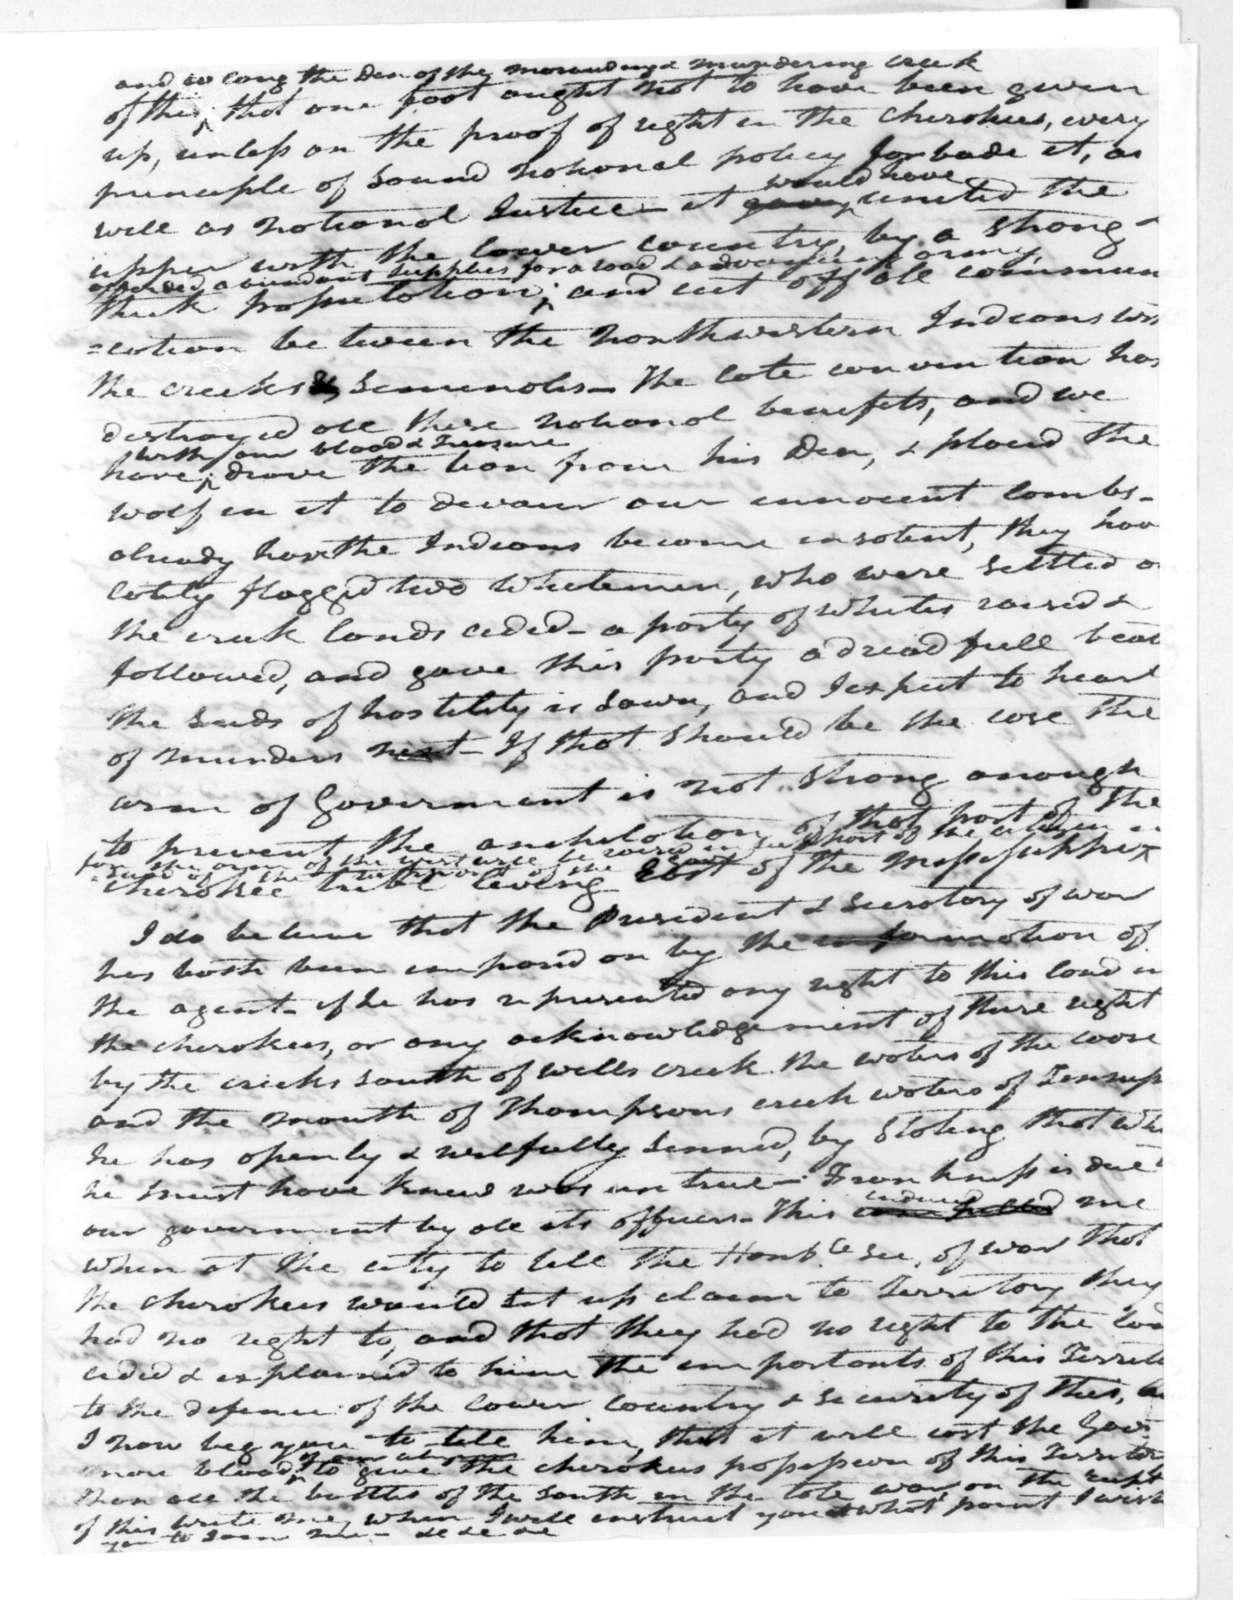 Andrew Jackson to James Gadsden, May 30, 1816